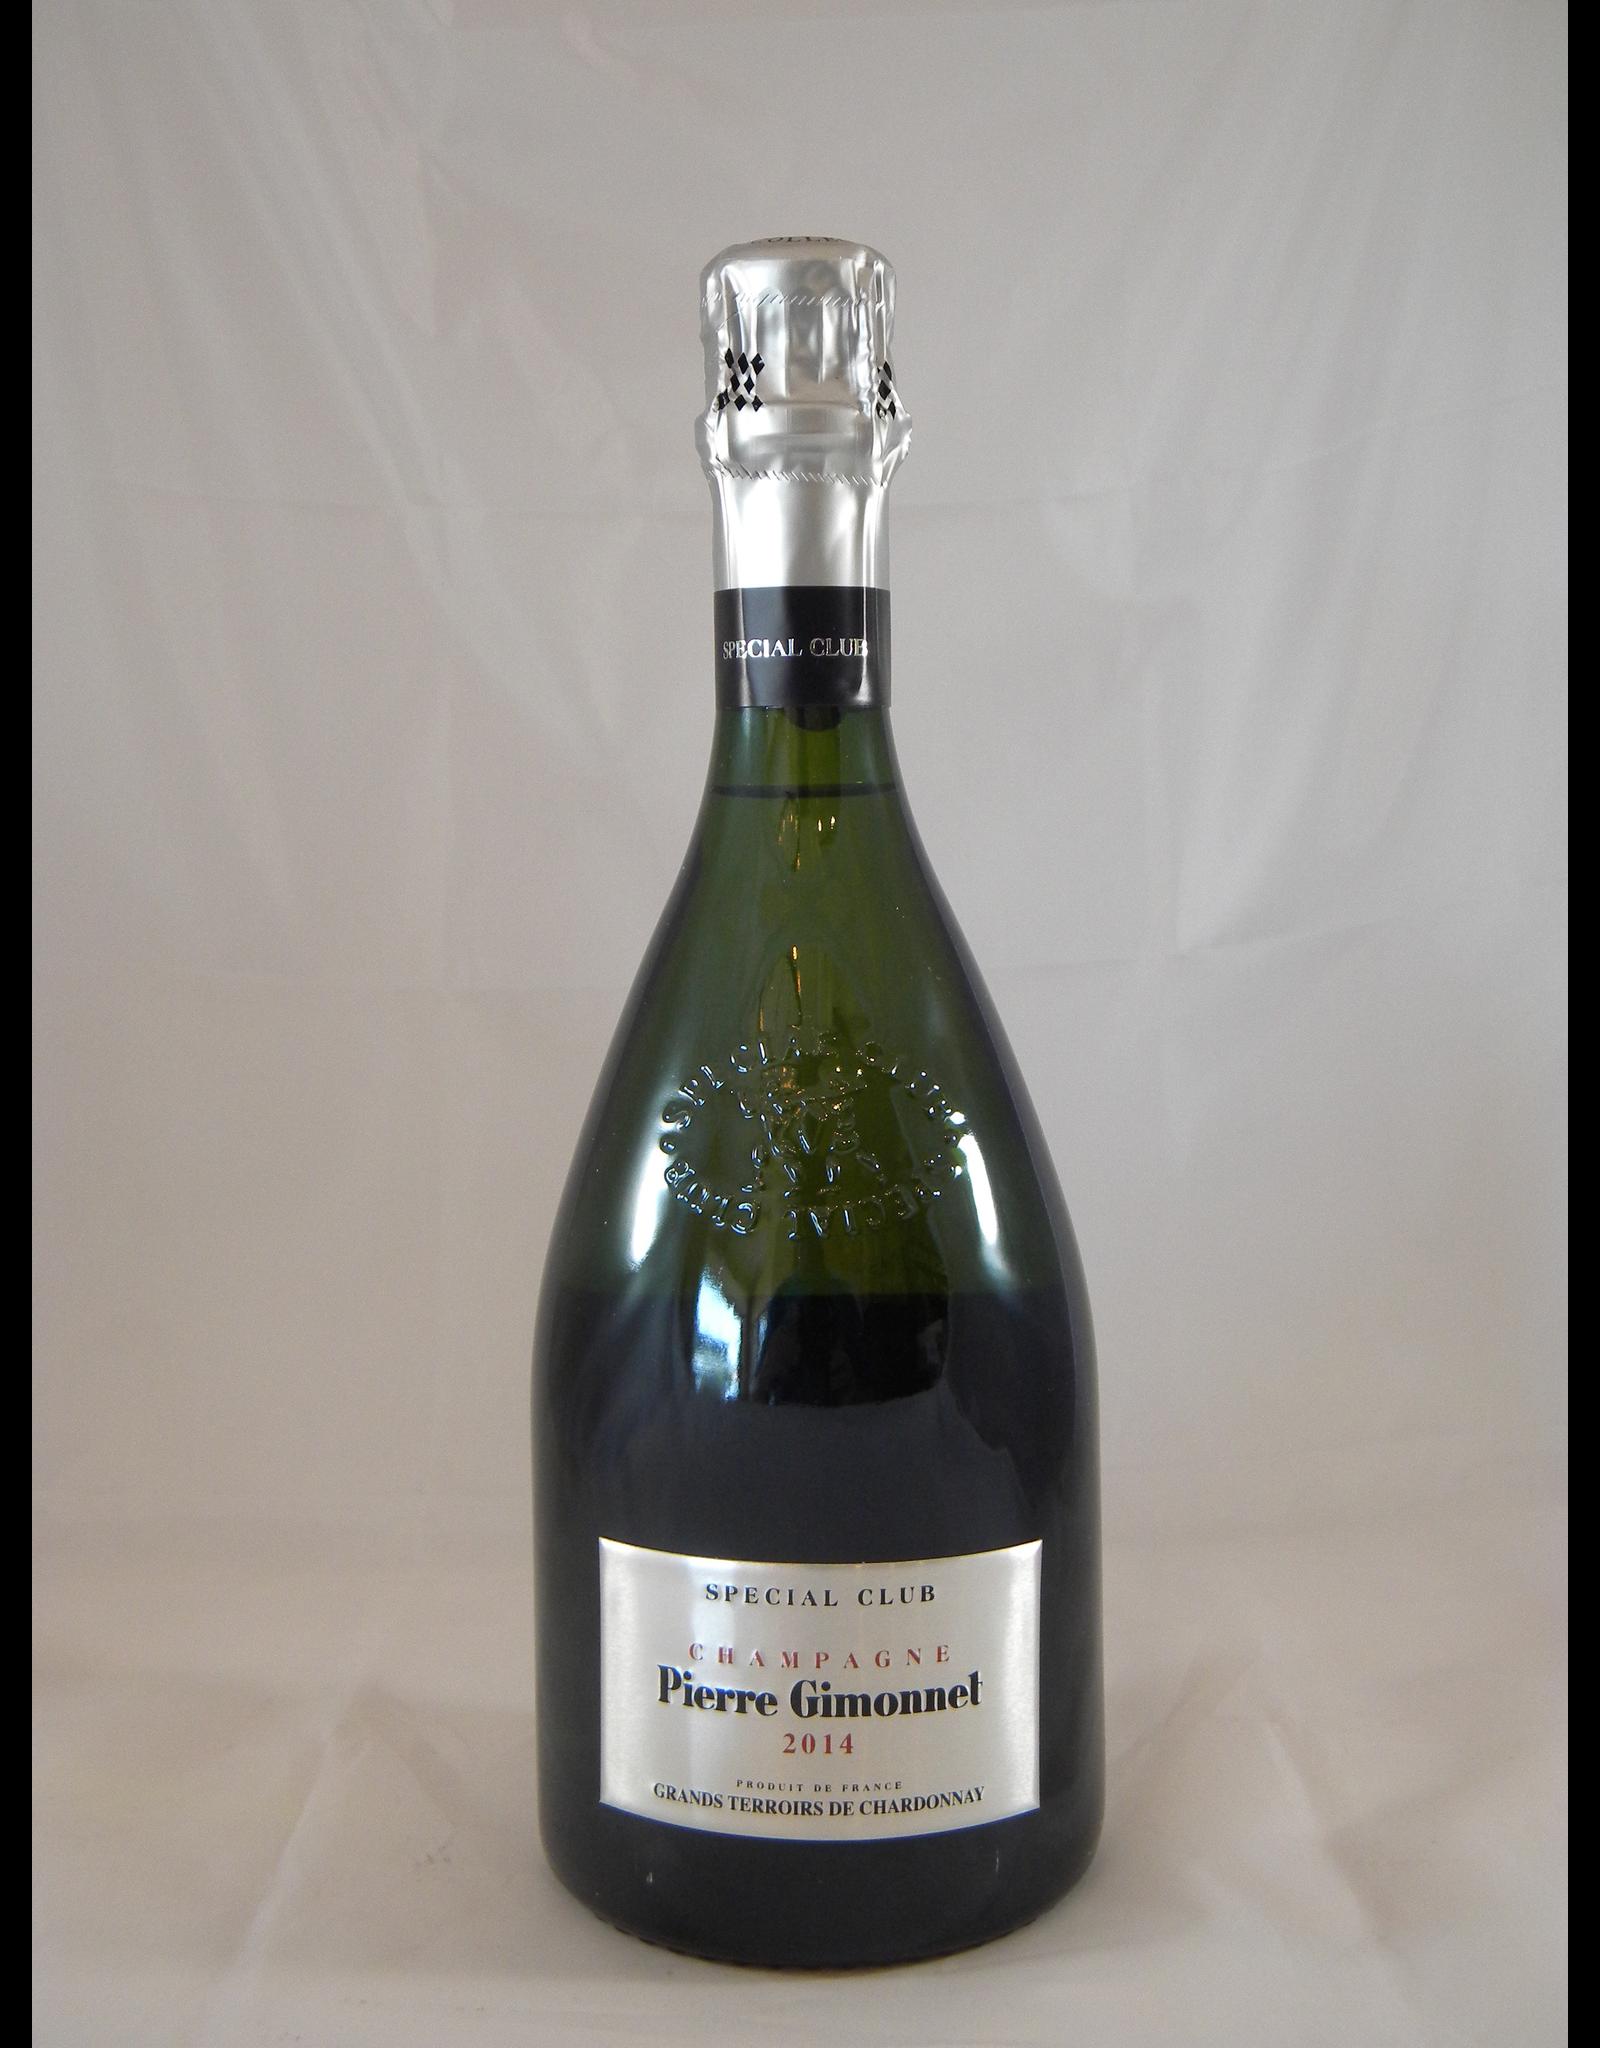 Pierre Gimonnet Champagne Brut Special Club 2014